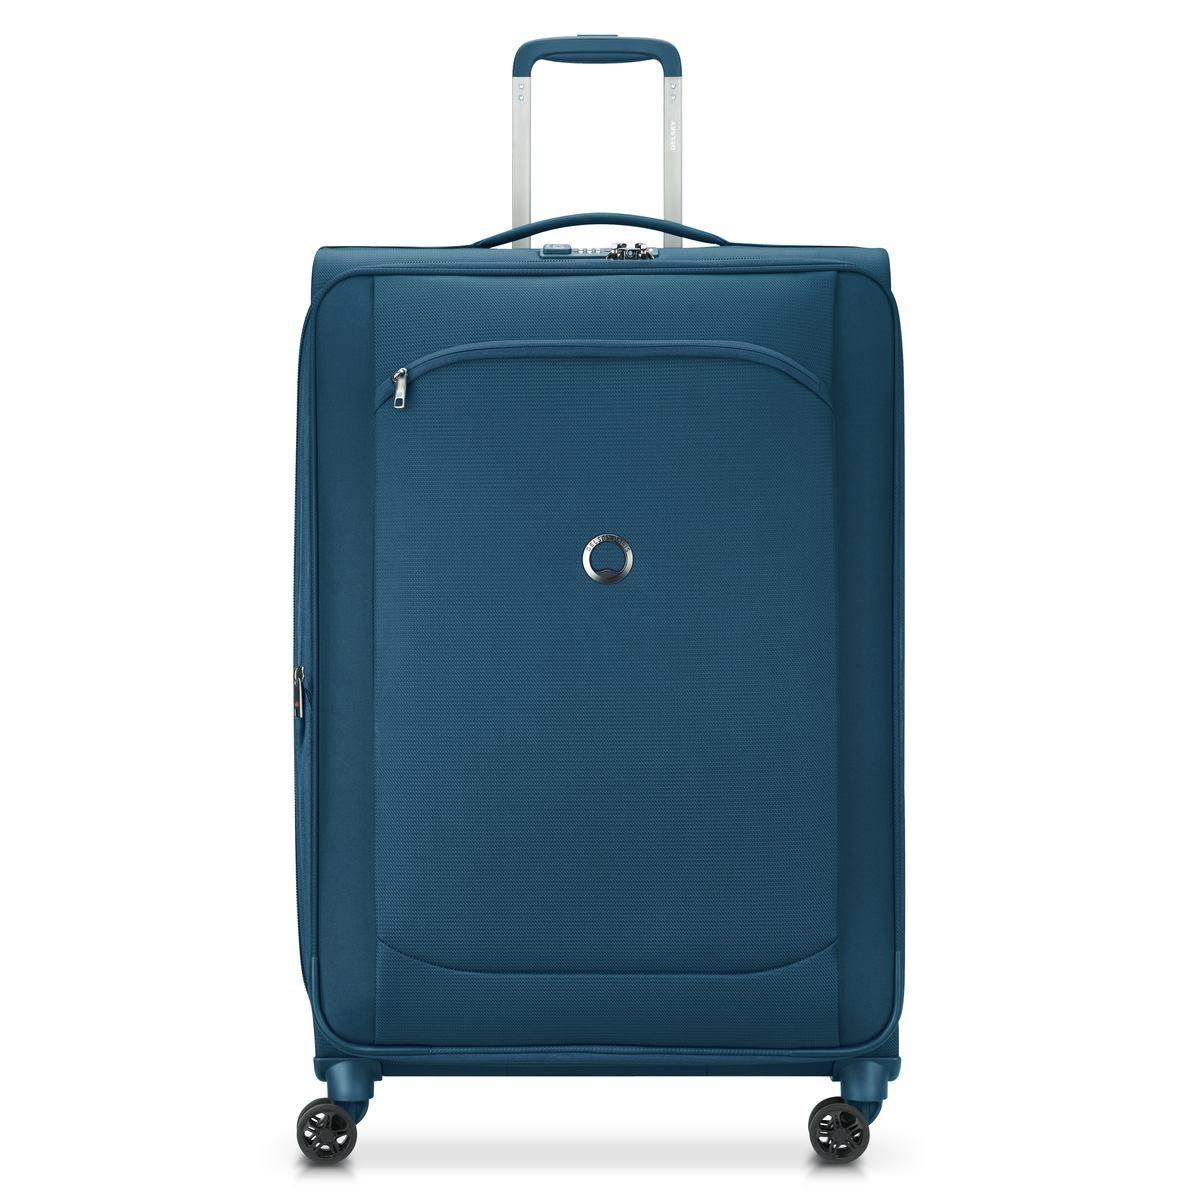 Delsey Βαλίτσα μεγάλη expandable 77,5x49x31cm Recycled σειρά Montmartre Air 2.0 Blue